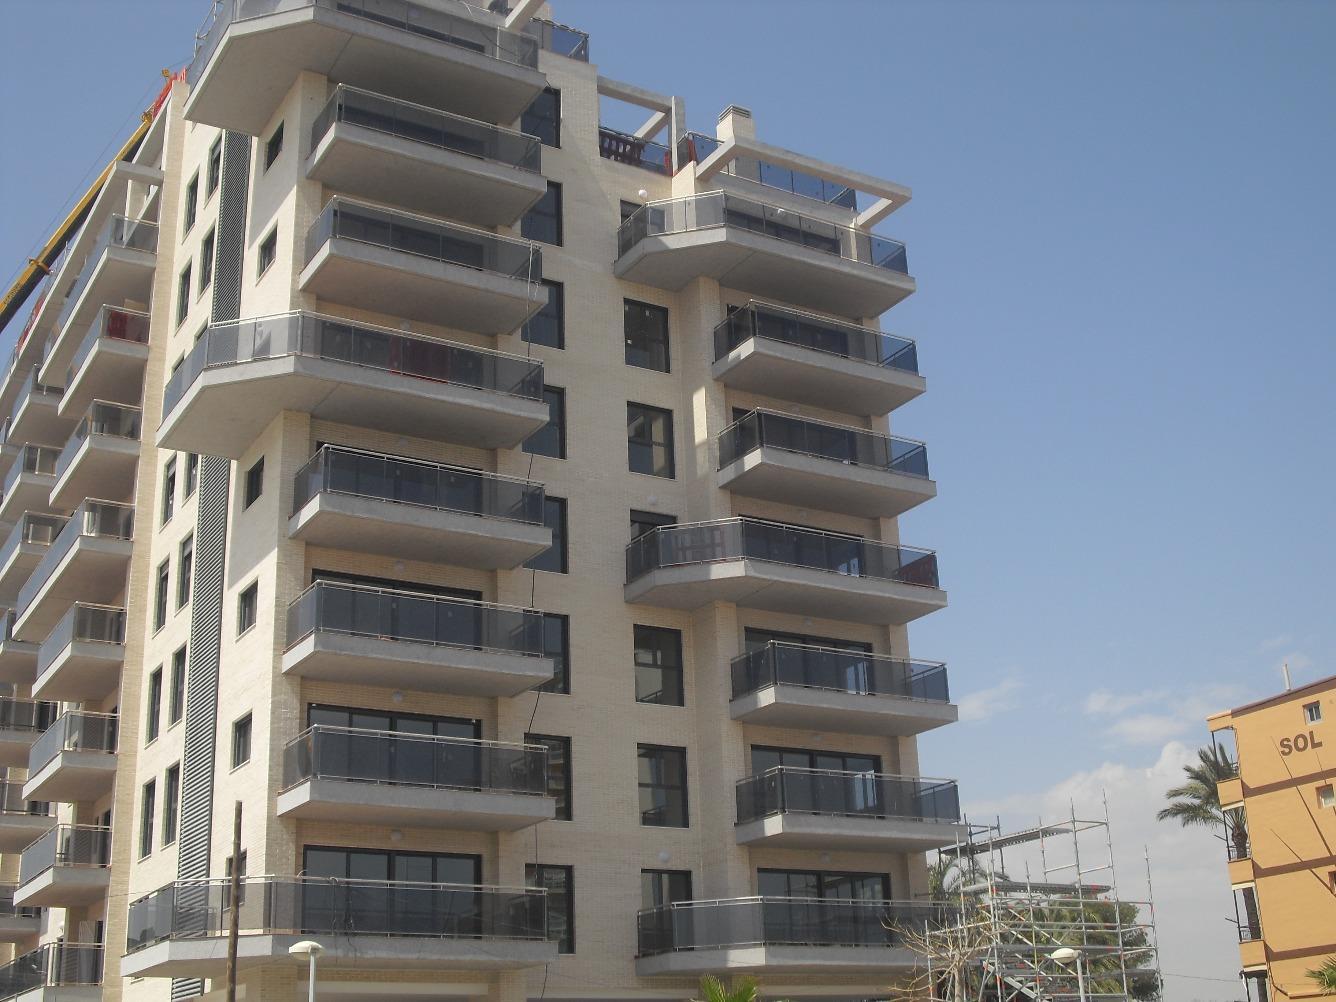 Piso en Alicante / Alacant